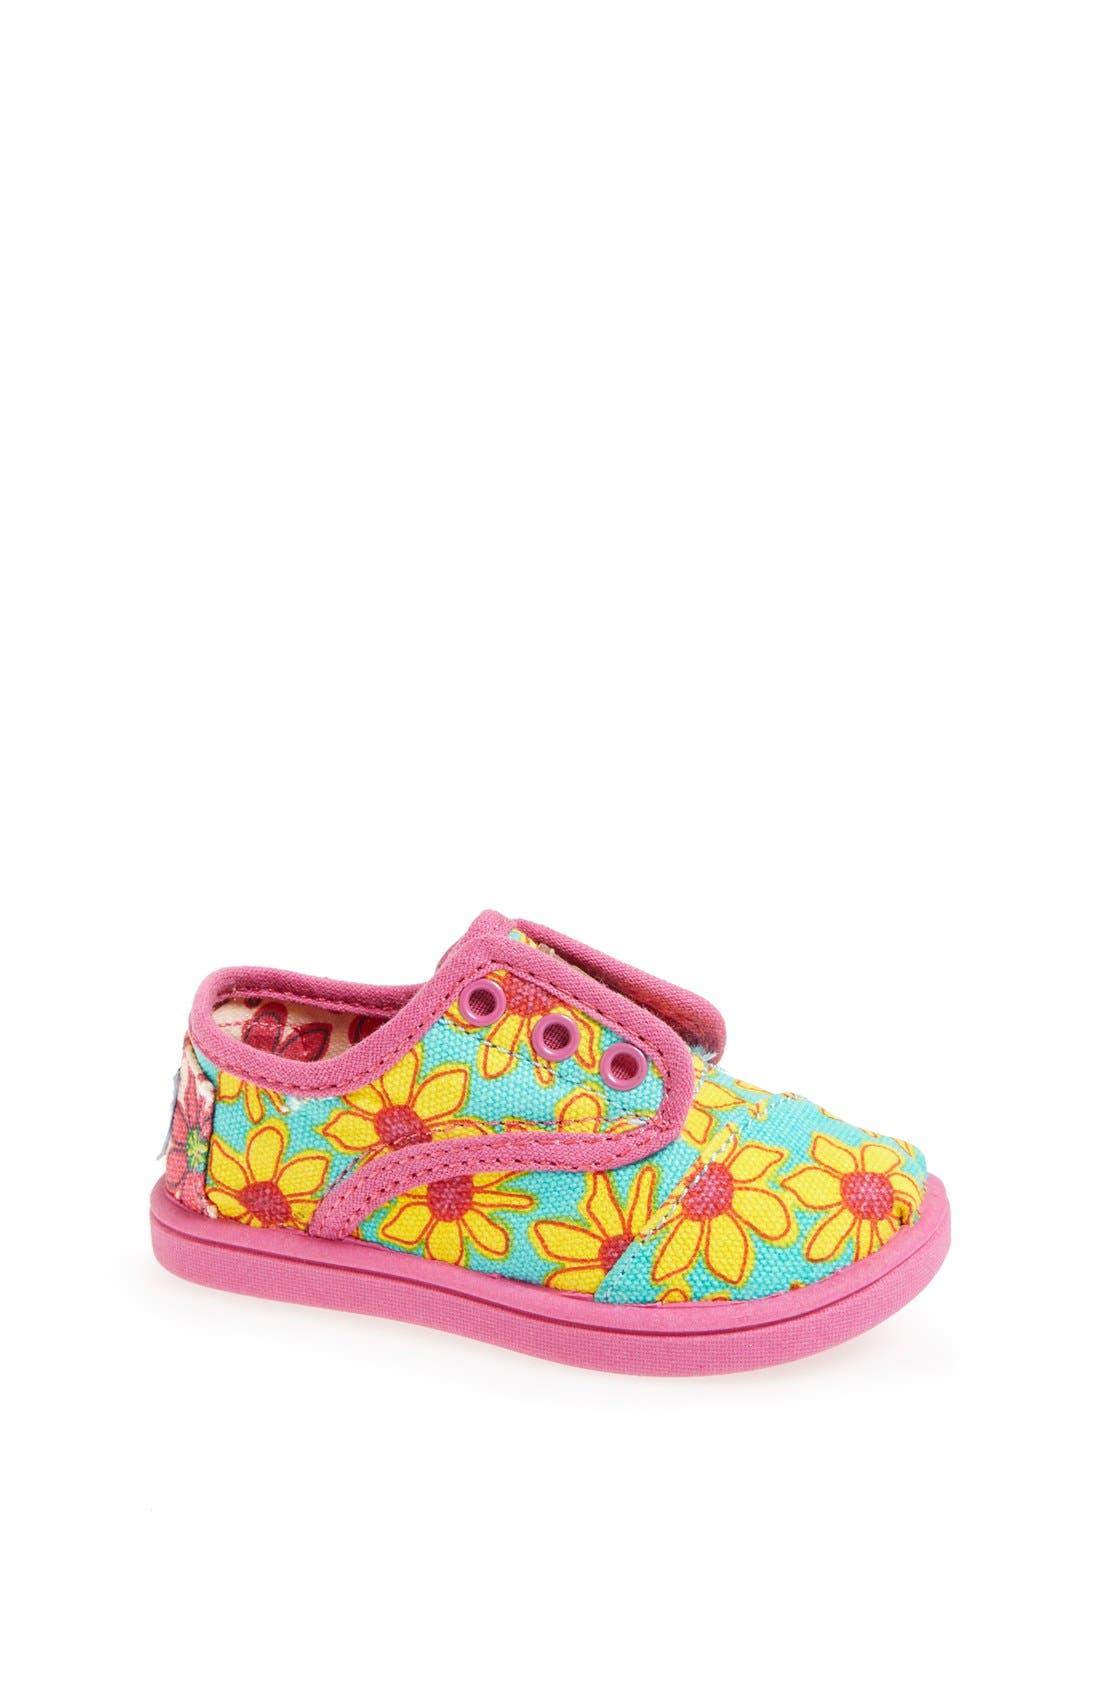 Main Image - TOMS 'Cordones - Tiny' Slip-On Sneaker (Baby, Walker & Toddler)